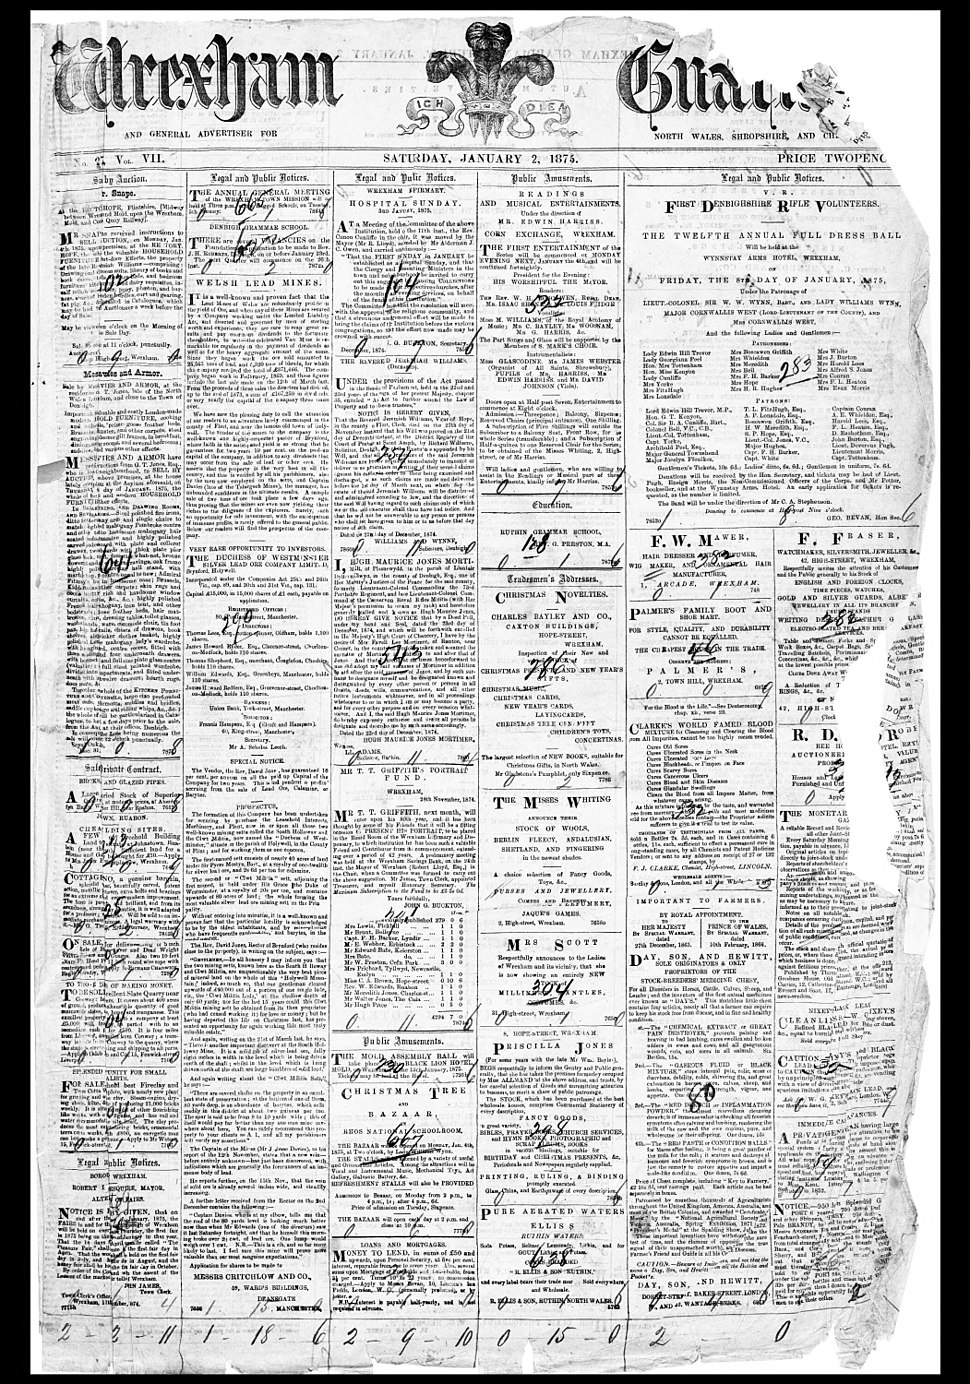 Wrexham Guardian Jan 2 1875